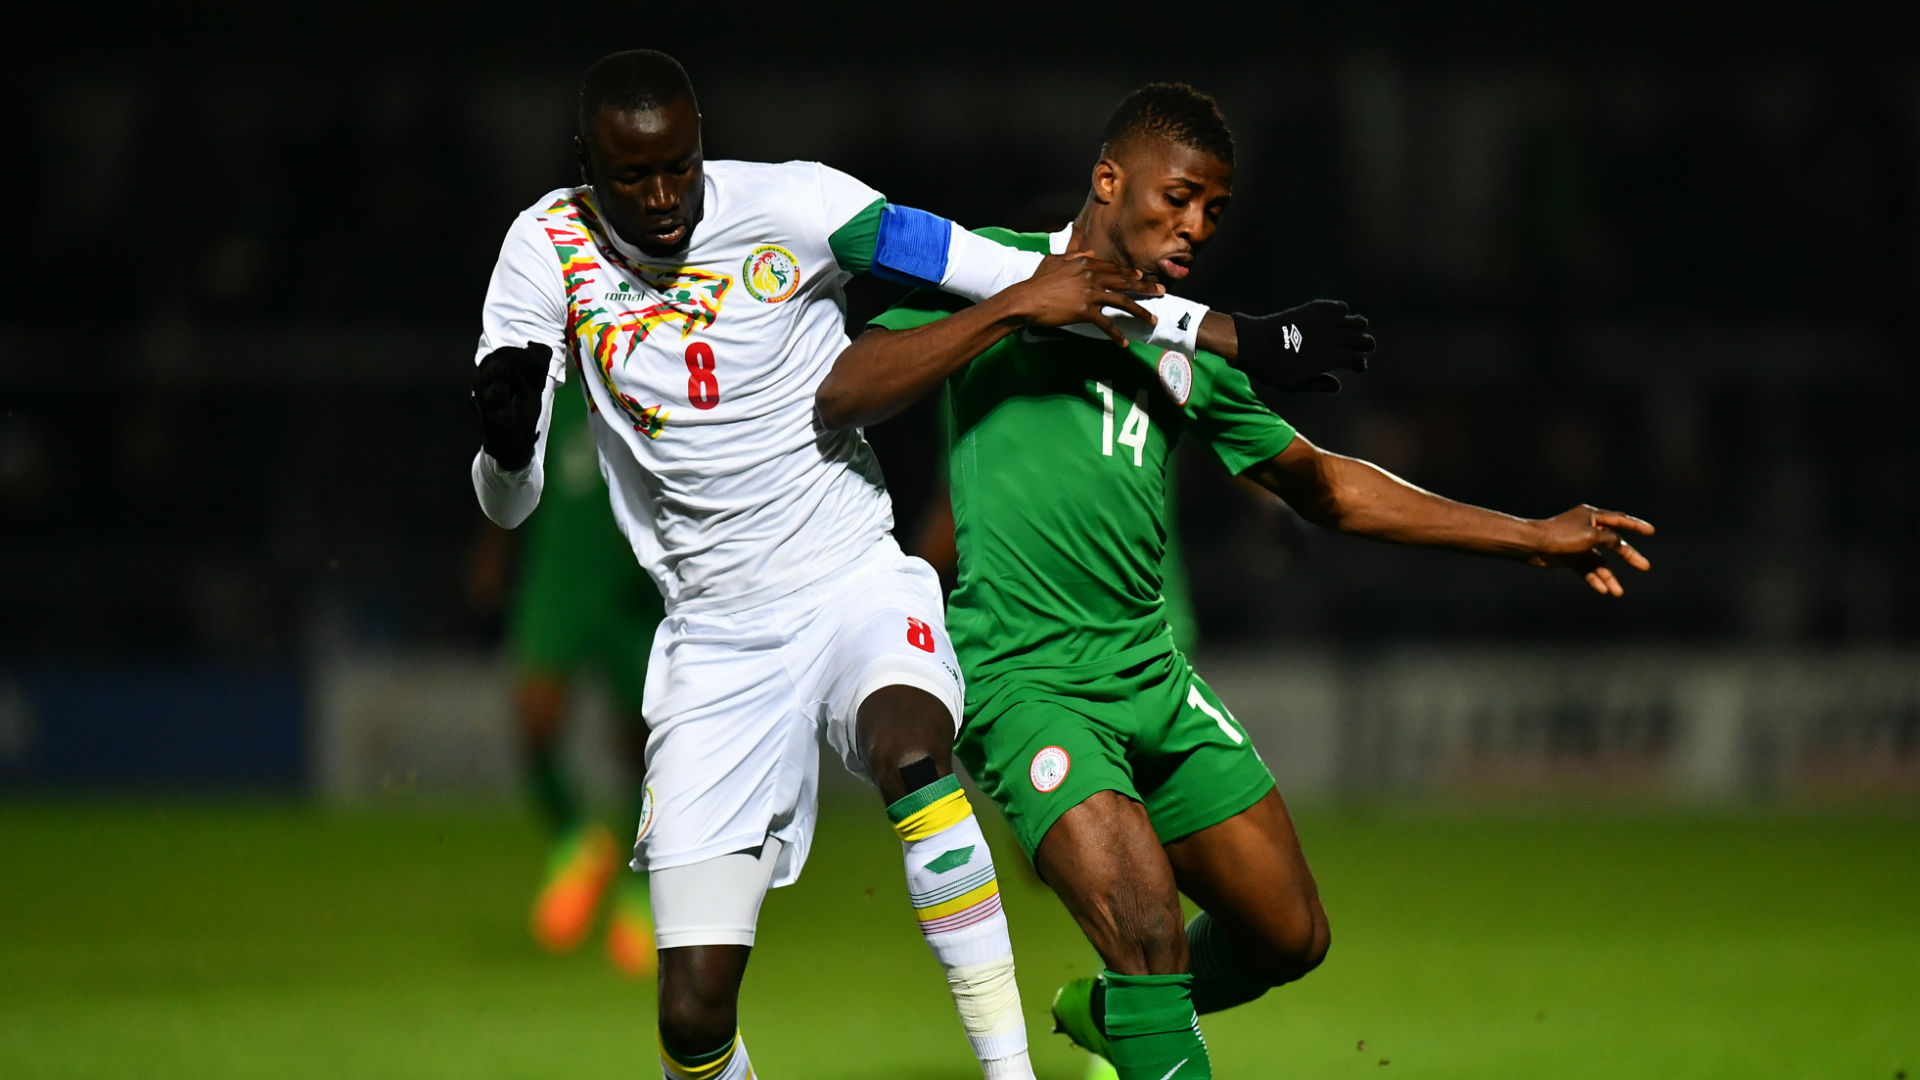 Cheikhou Kouyate & Iheanacho